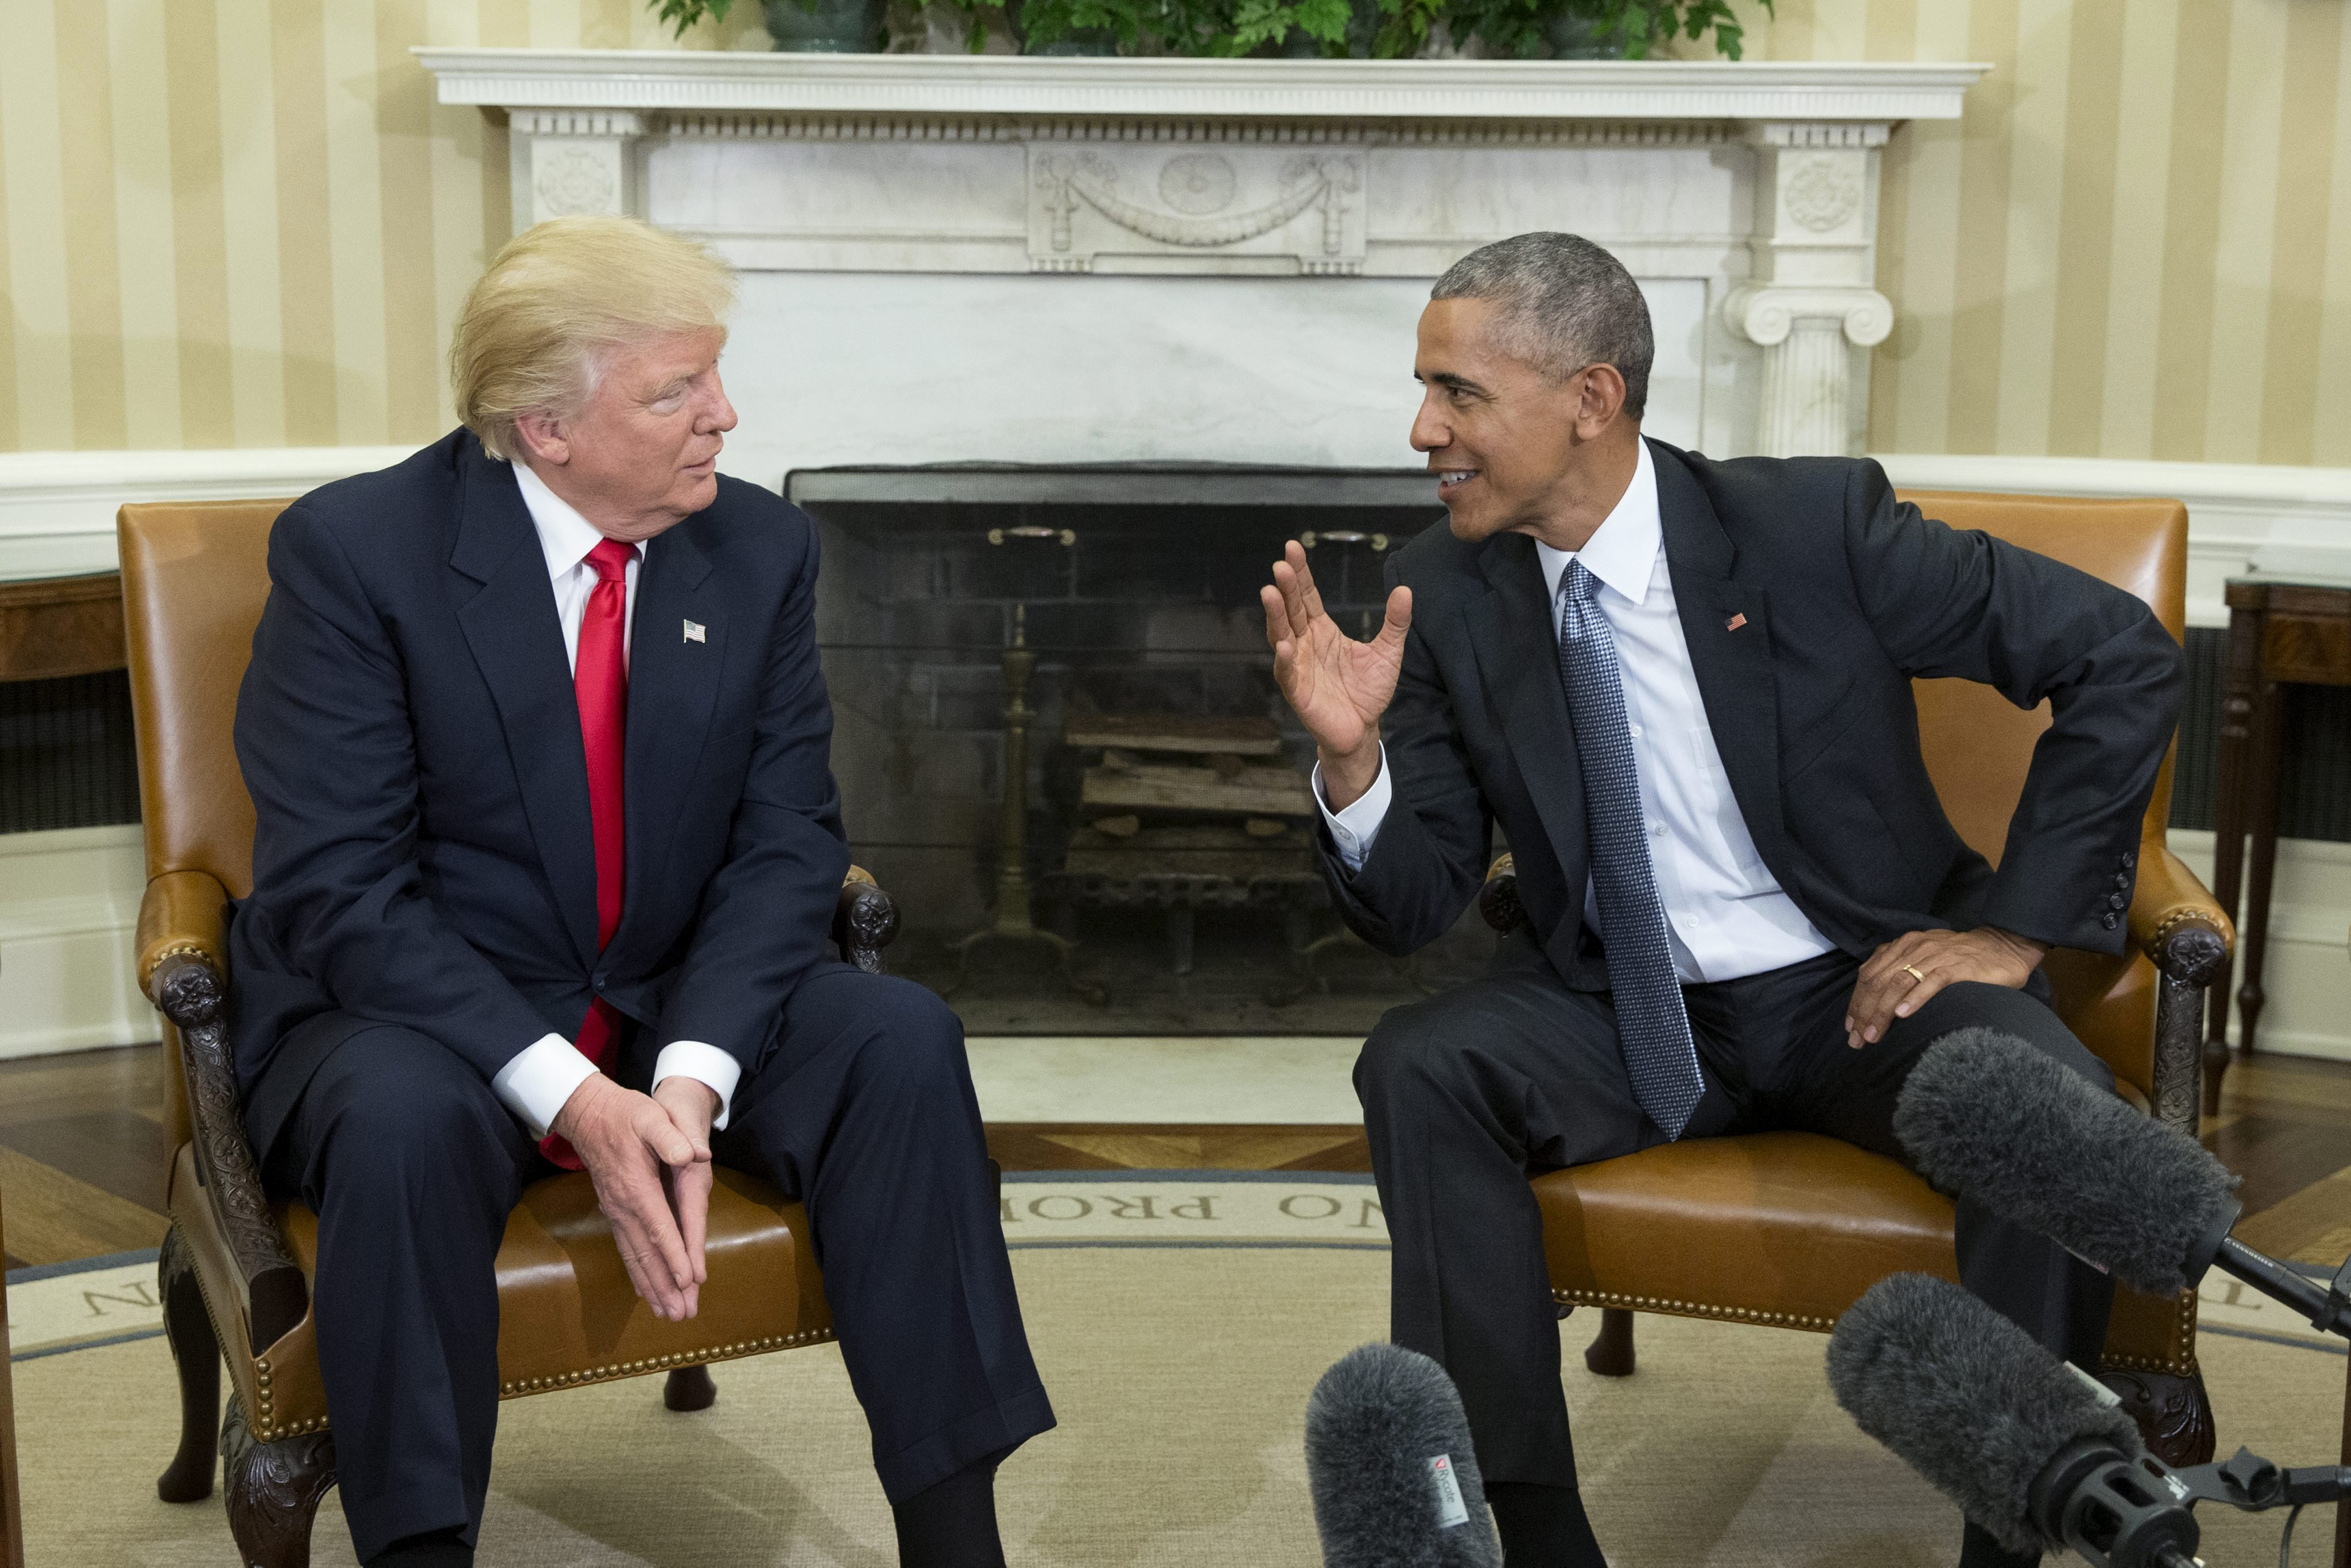 Trump Acknowledges Russian 'Meddling' in Tweet Criticizing Obama